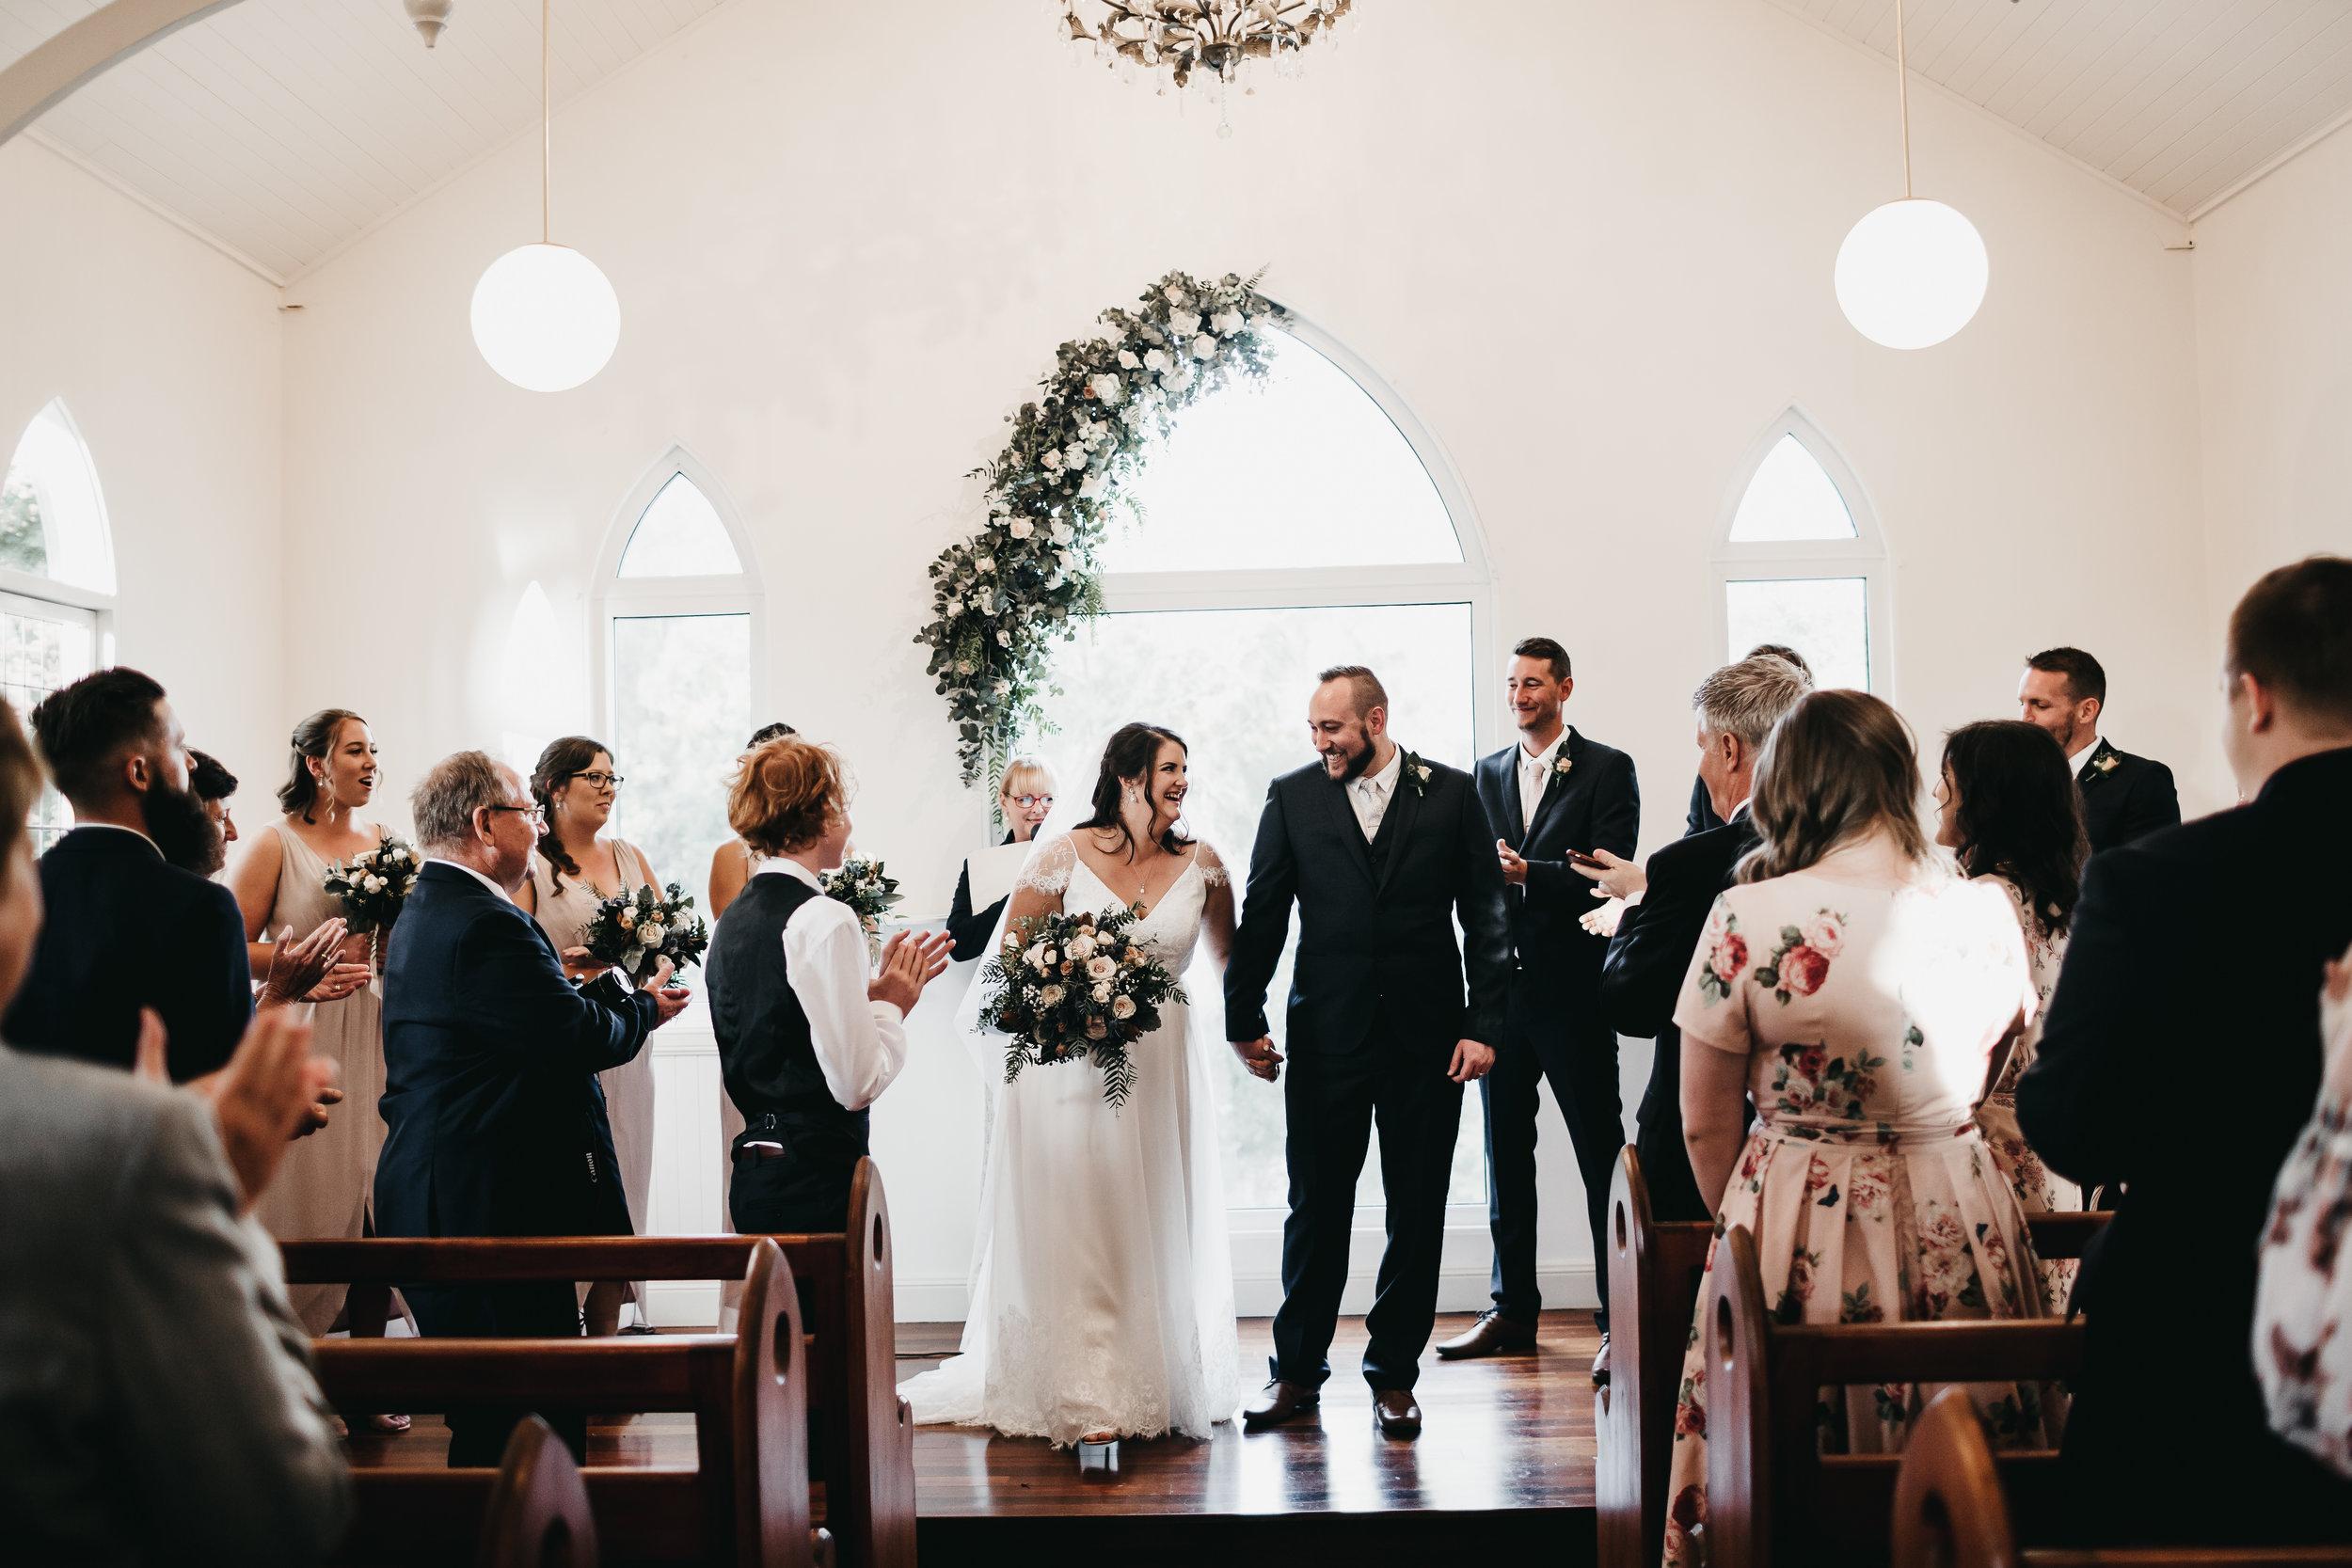 bondwedding-415.jpg